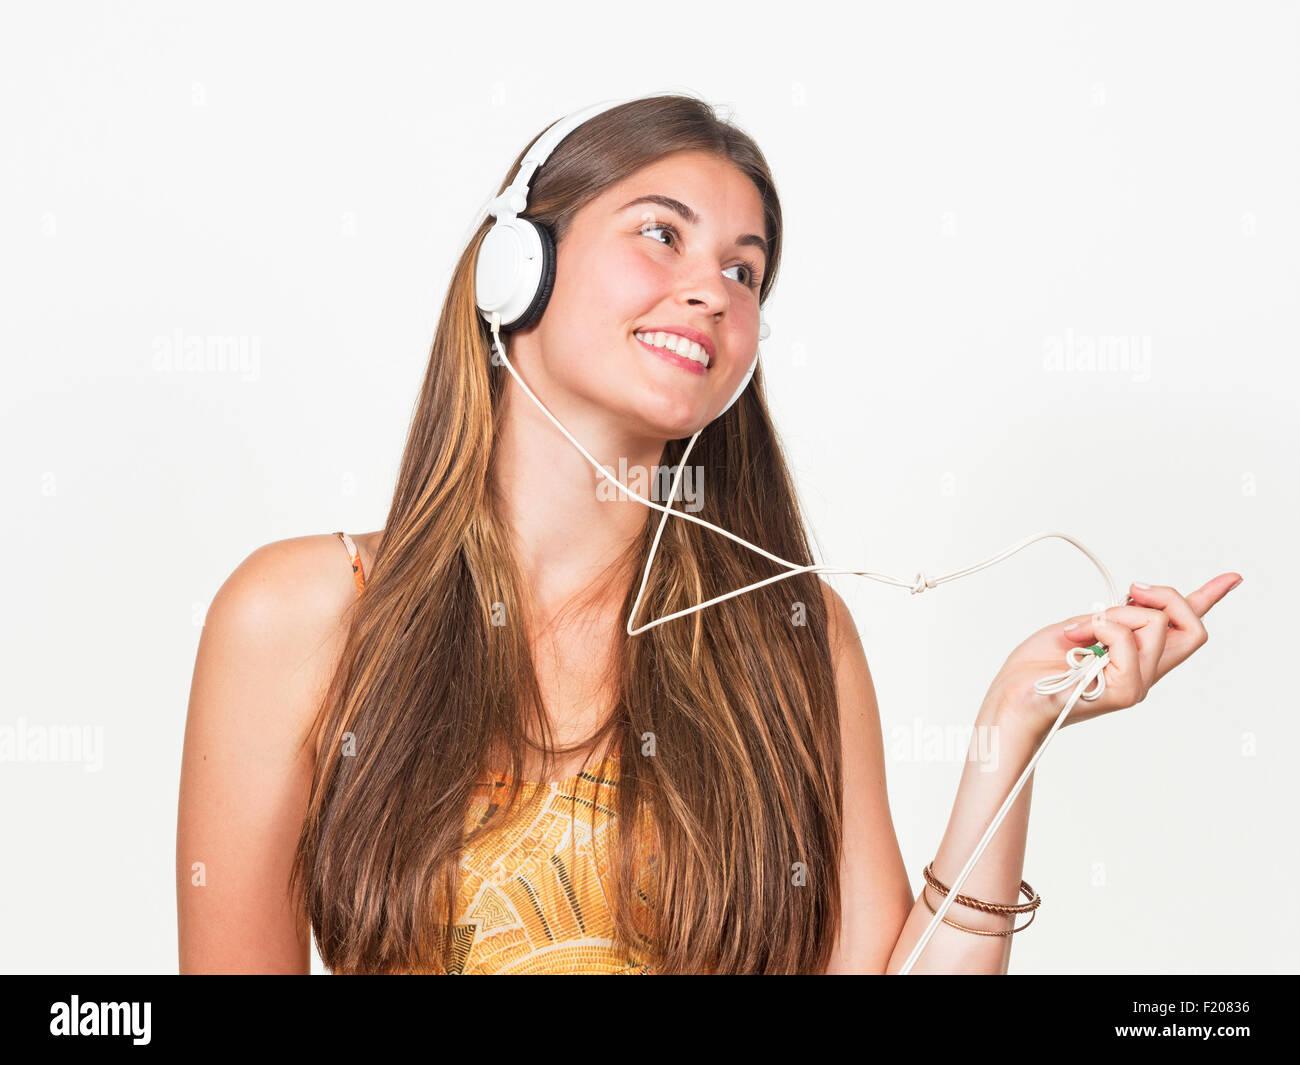 Junge Frau mit Kopfhörern Imagens de Stock